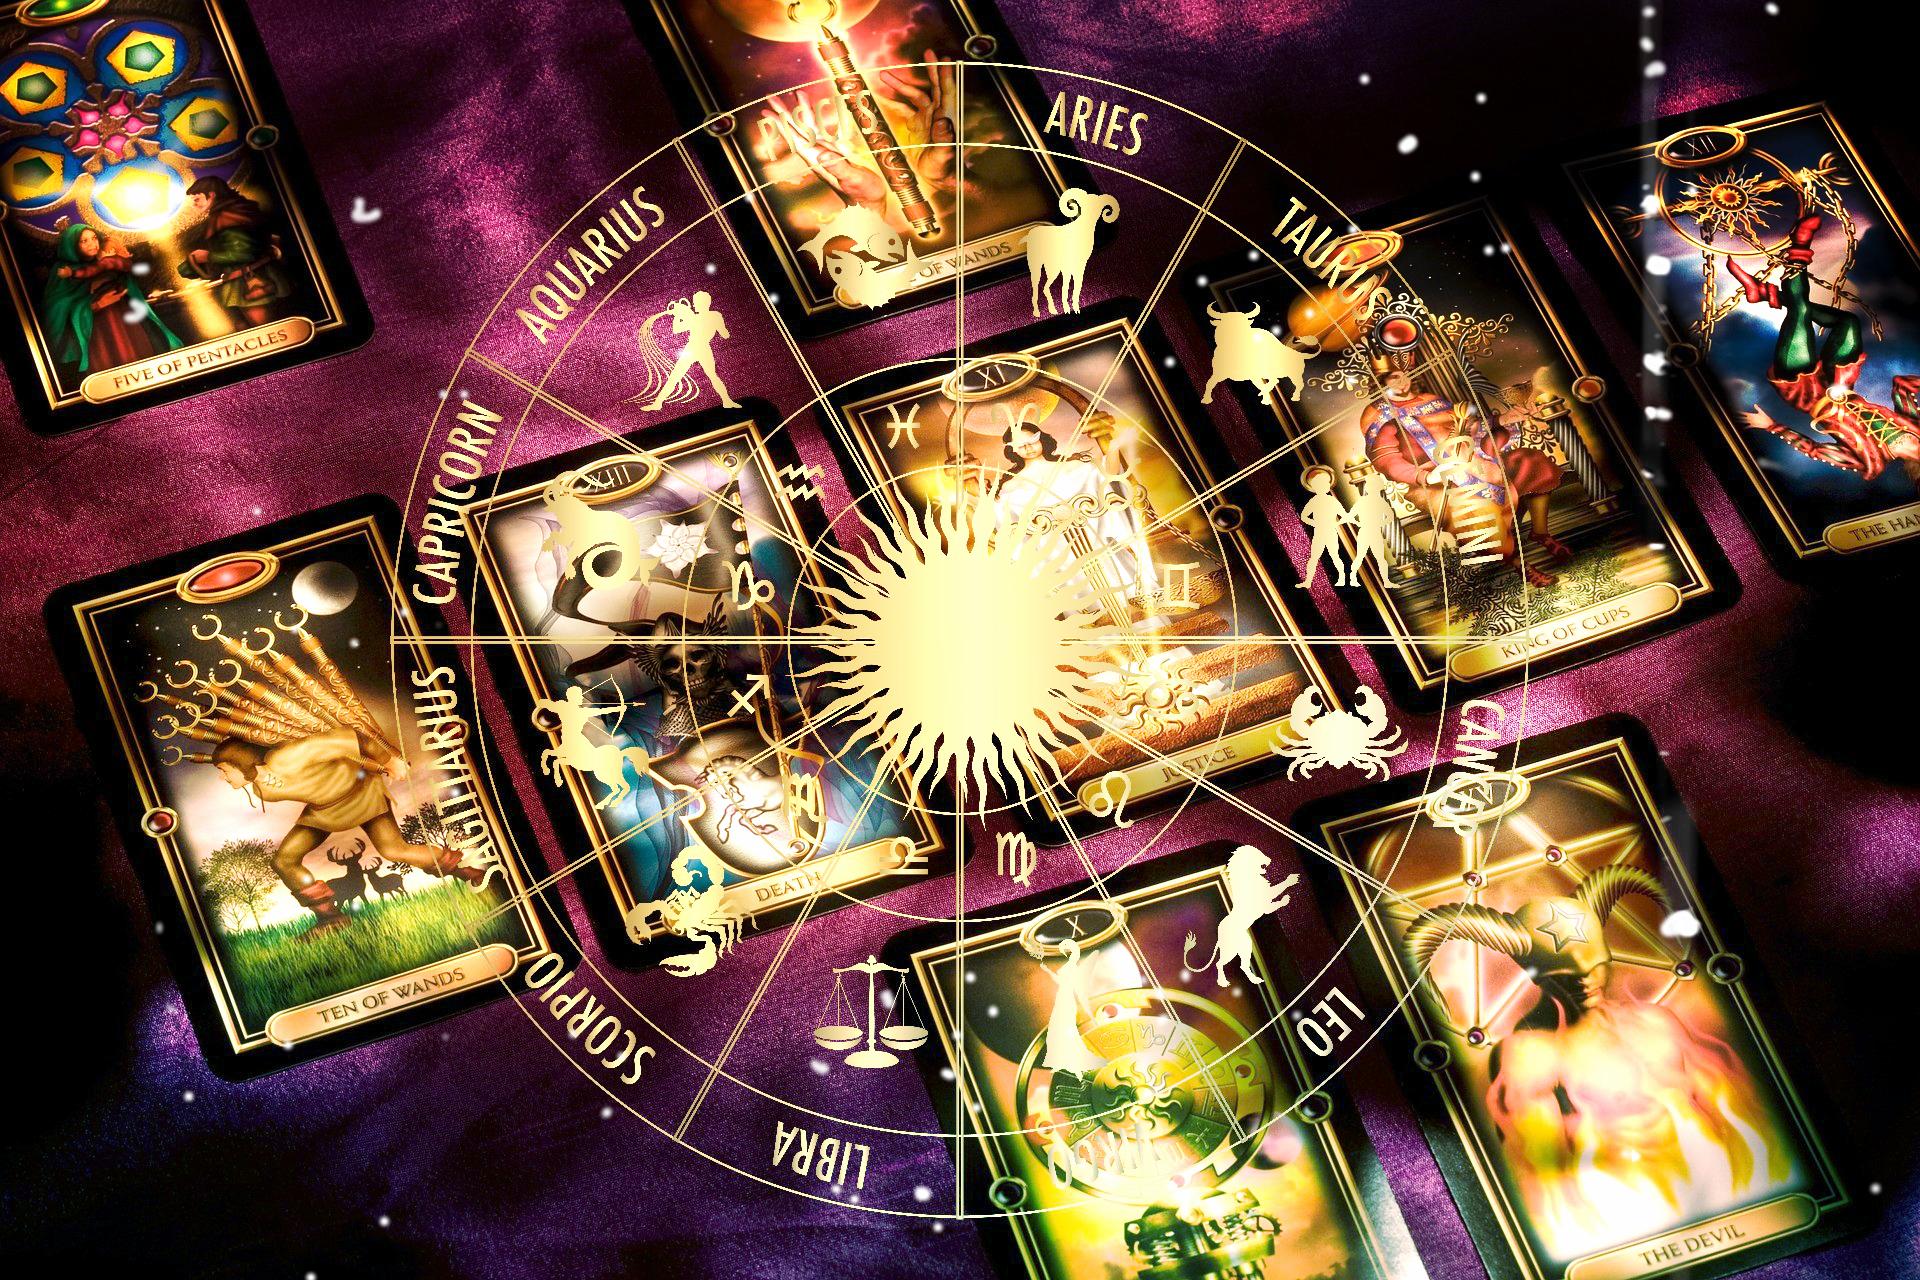 Гадание на картах таро по знаку зодиака видео заклинания для гадания на картах